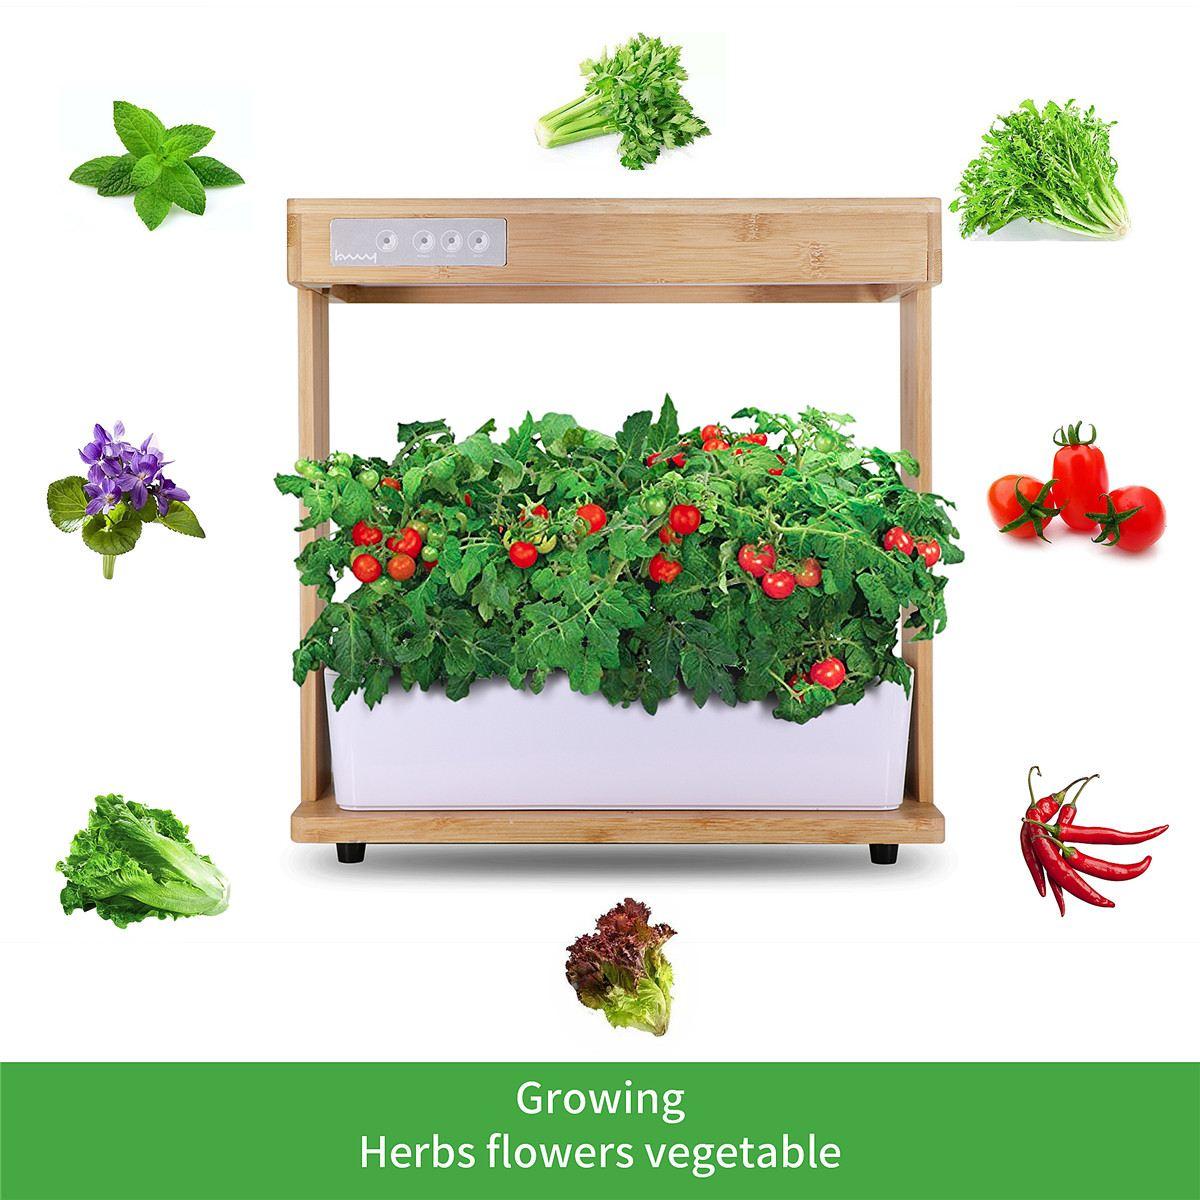 Caja de cultivo de flores para vivero, maceta automática absorbente de agua, maceta hidropónica inteligente, Equipo de cultivo sin tierra